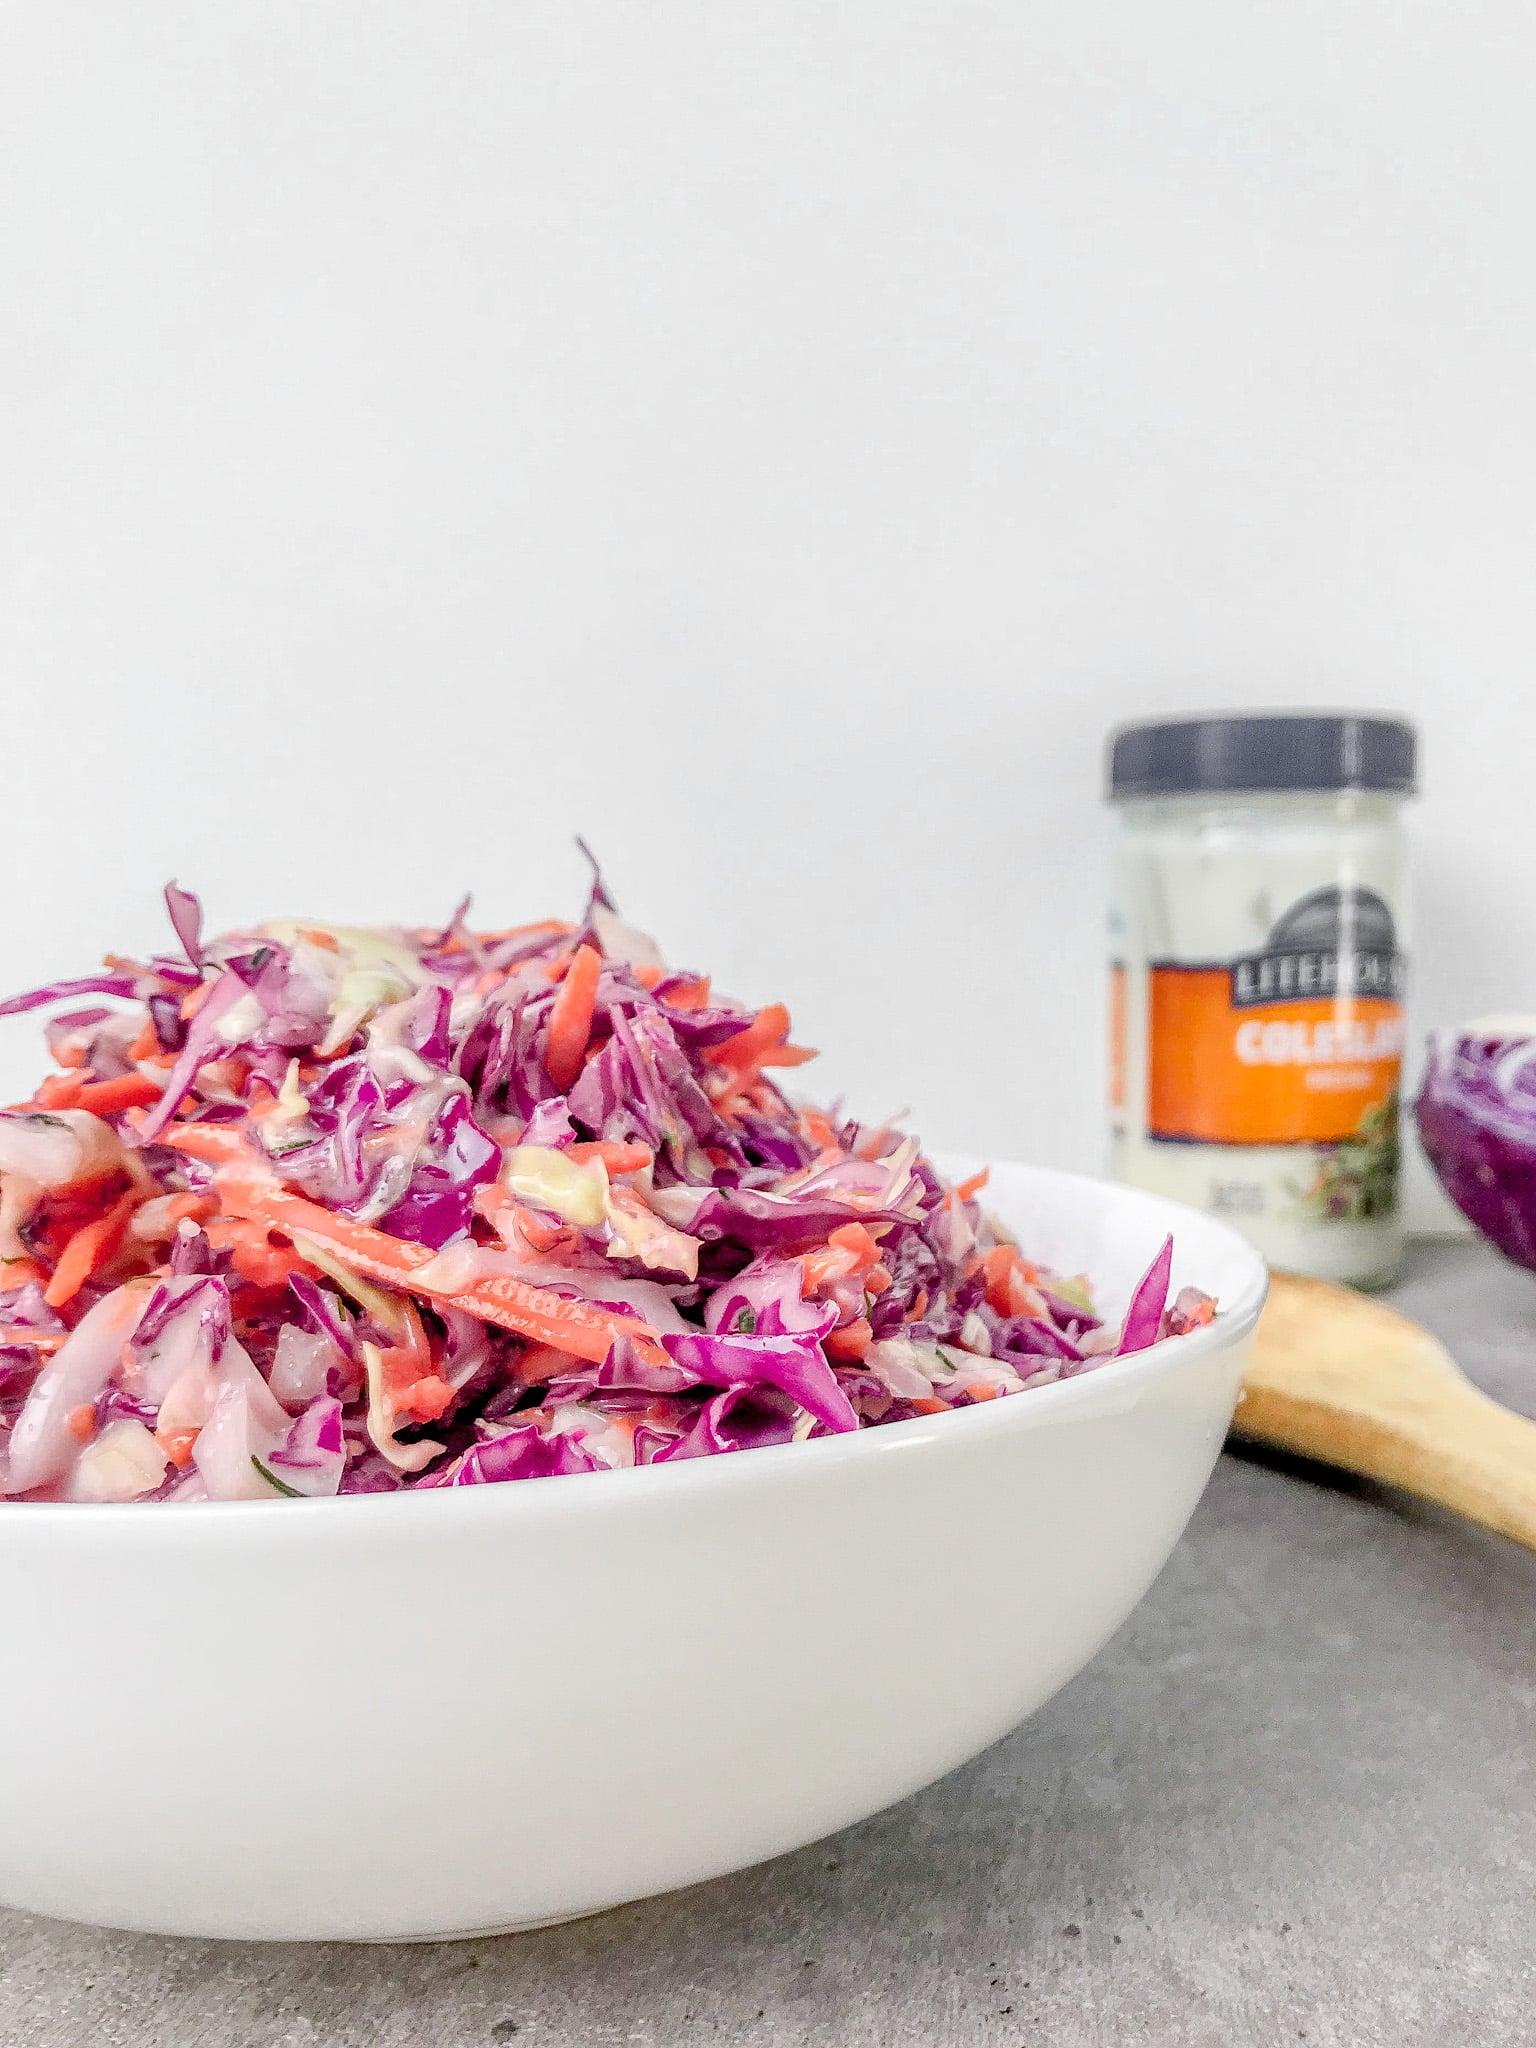 Homemade Coleslaw Salad